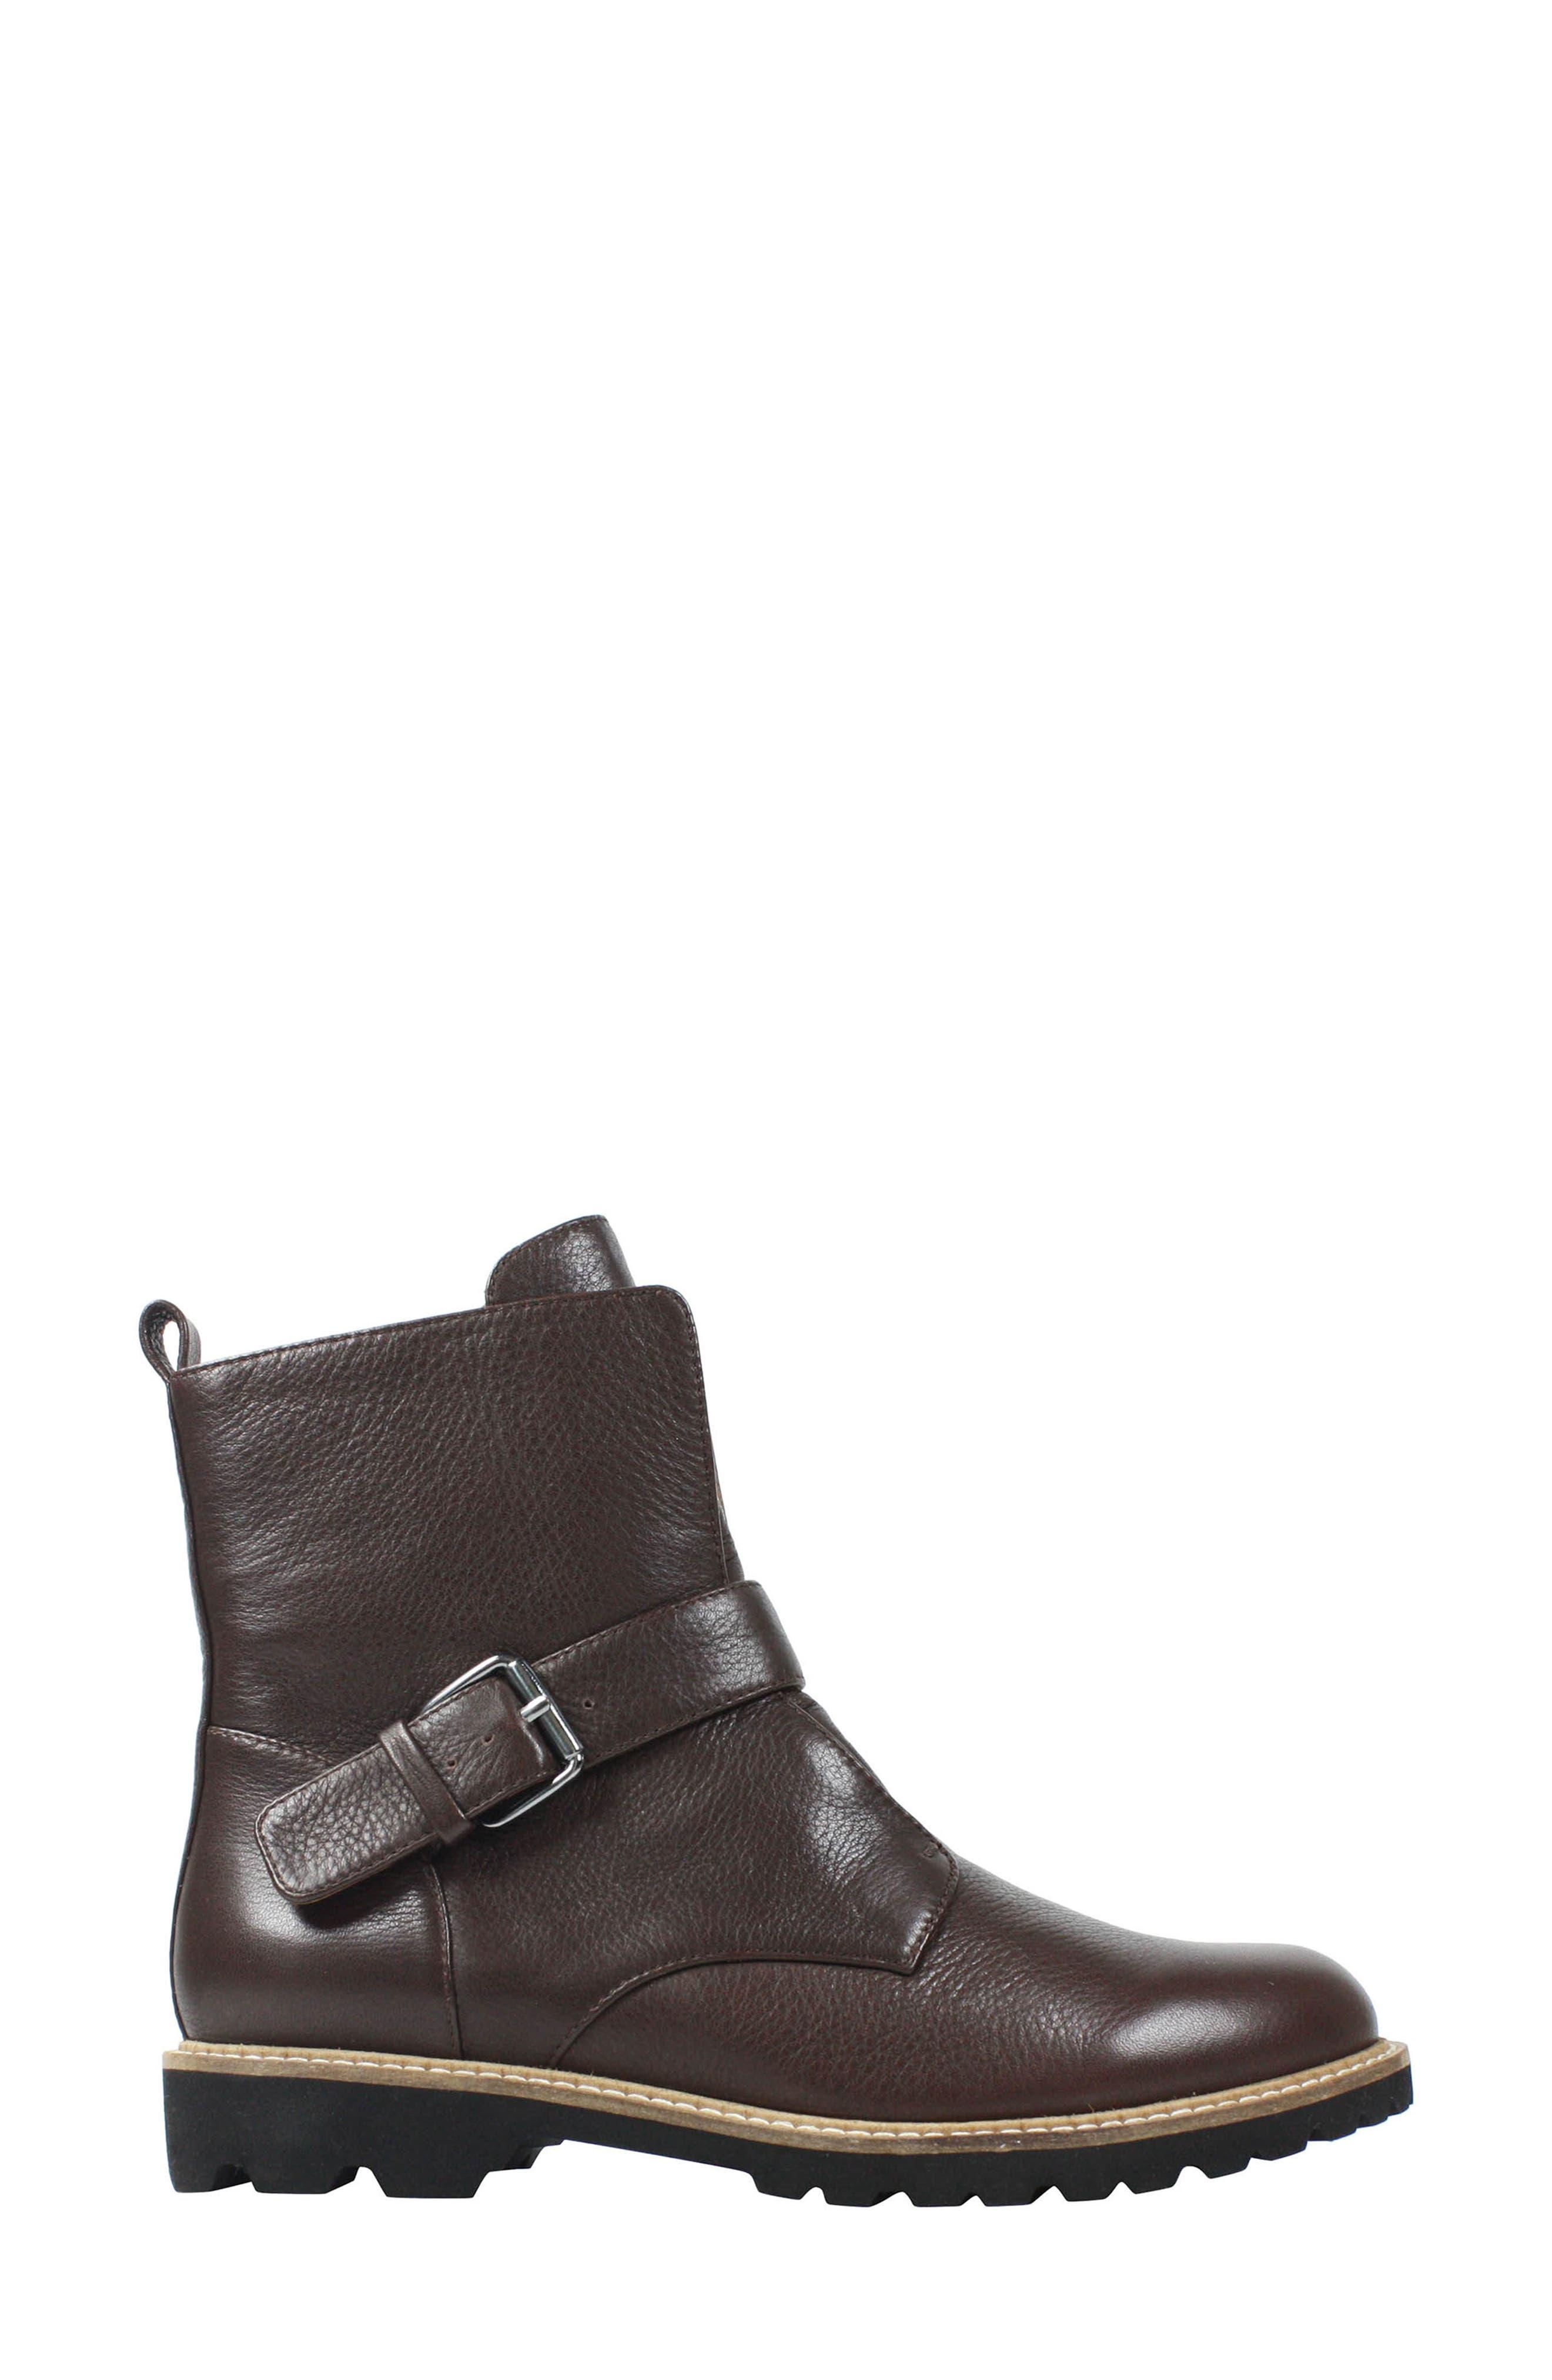 Rapolano Boot,                             Alternate thumbnail 3, color,                             Moro Leather